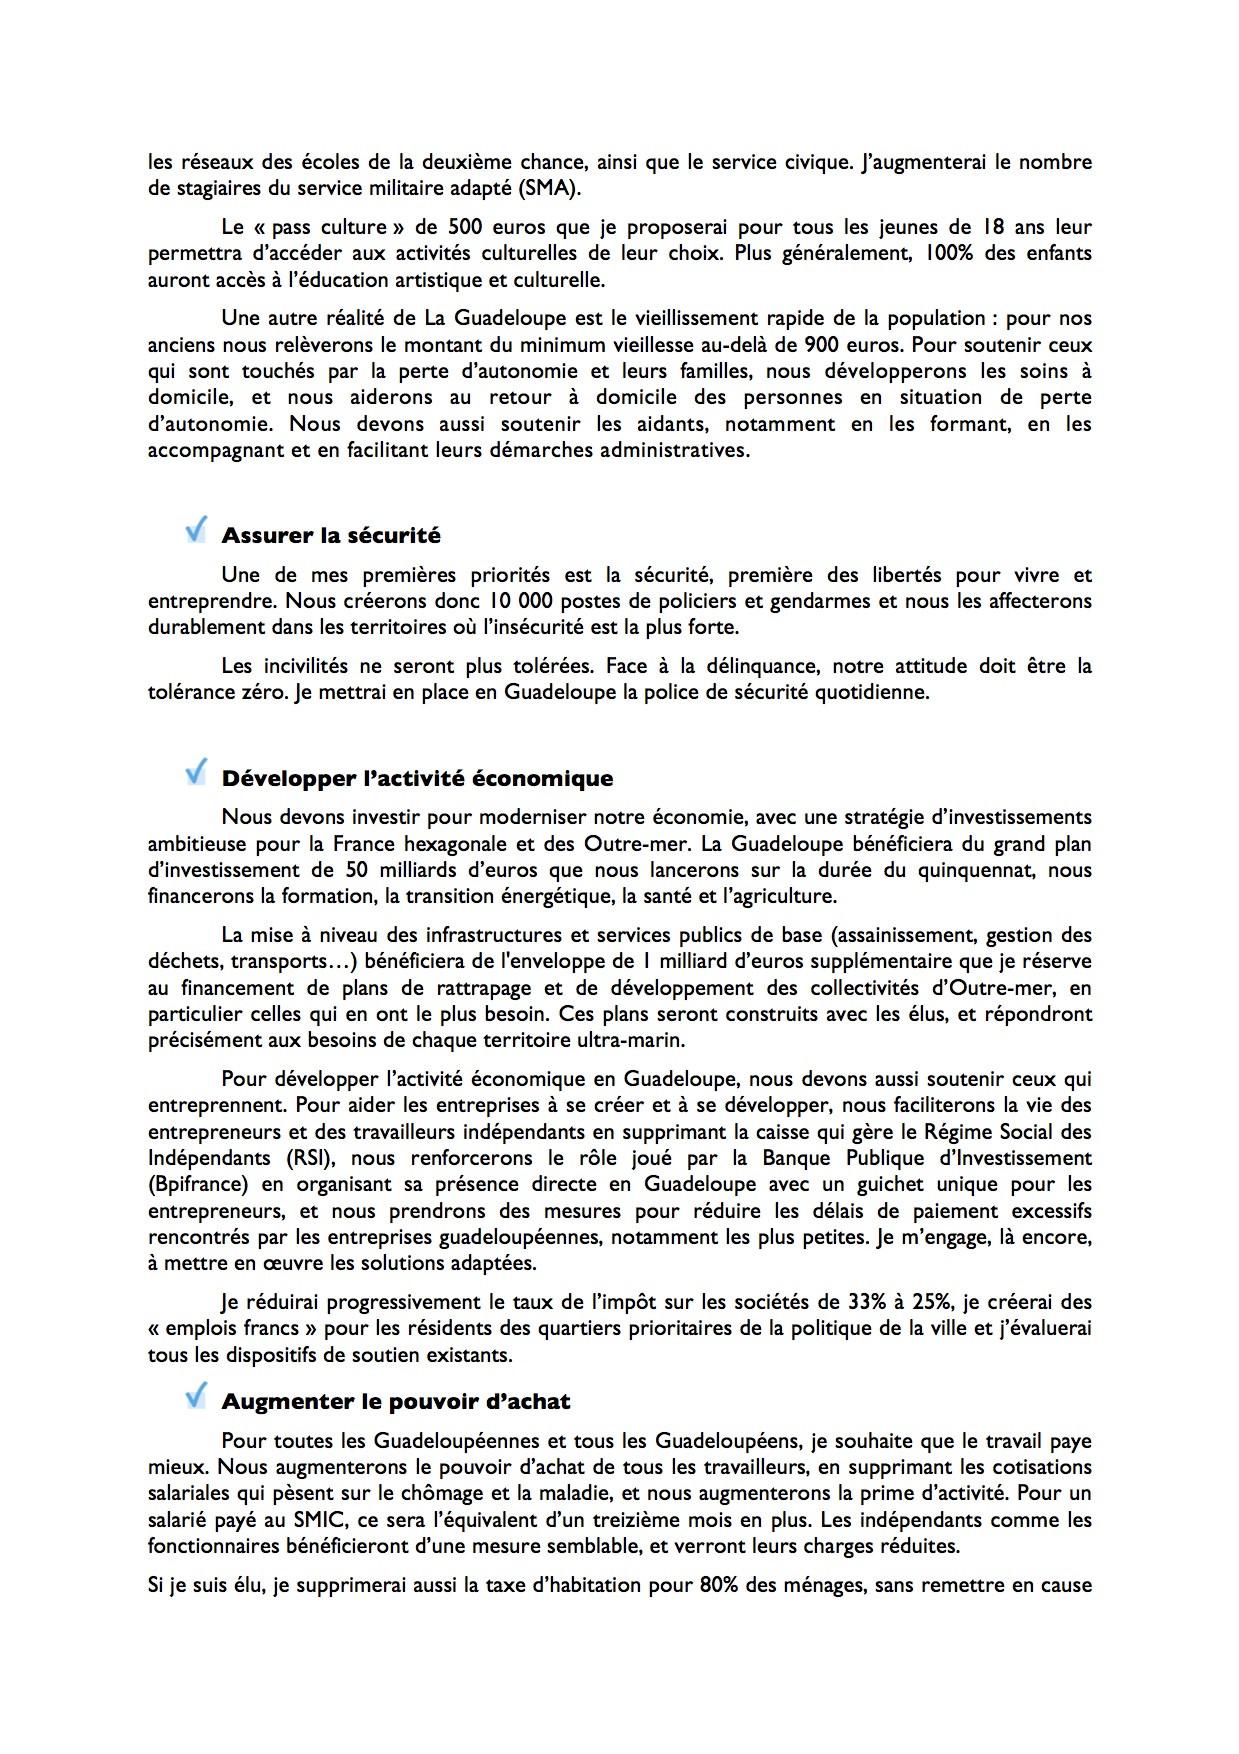 lettre-ouverte-Guadeloupe-2